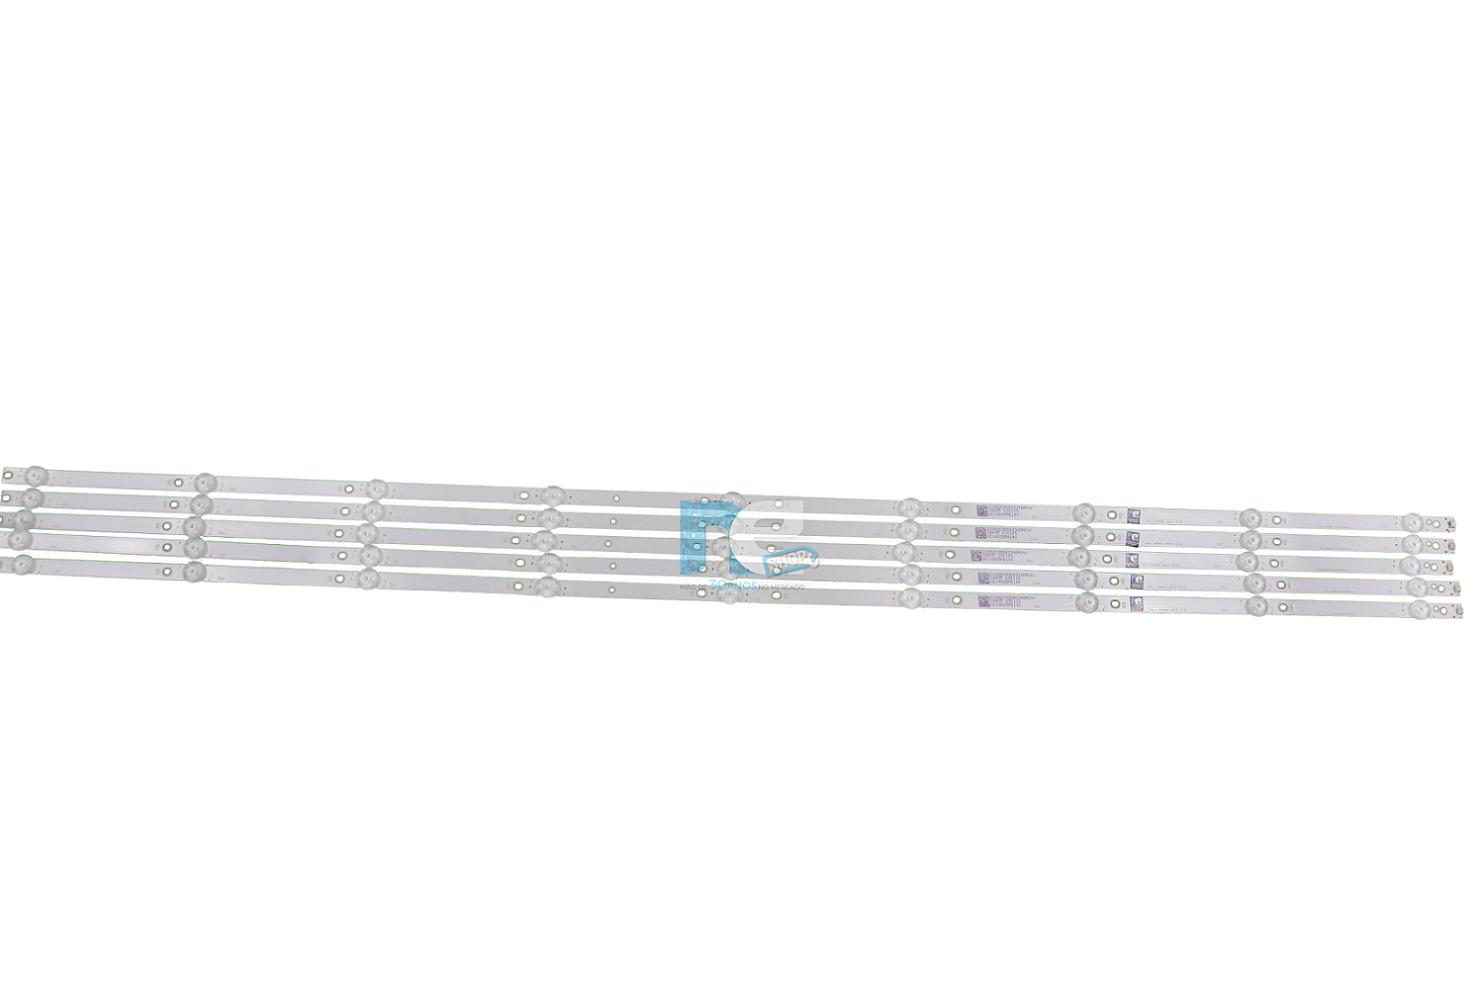 KIT BARRA DE LED PHILIPS 55PUG6513 55PUG6513/78